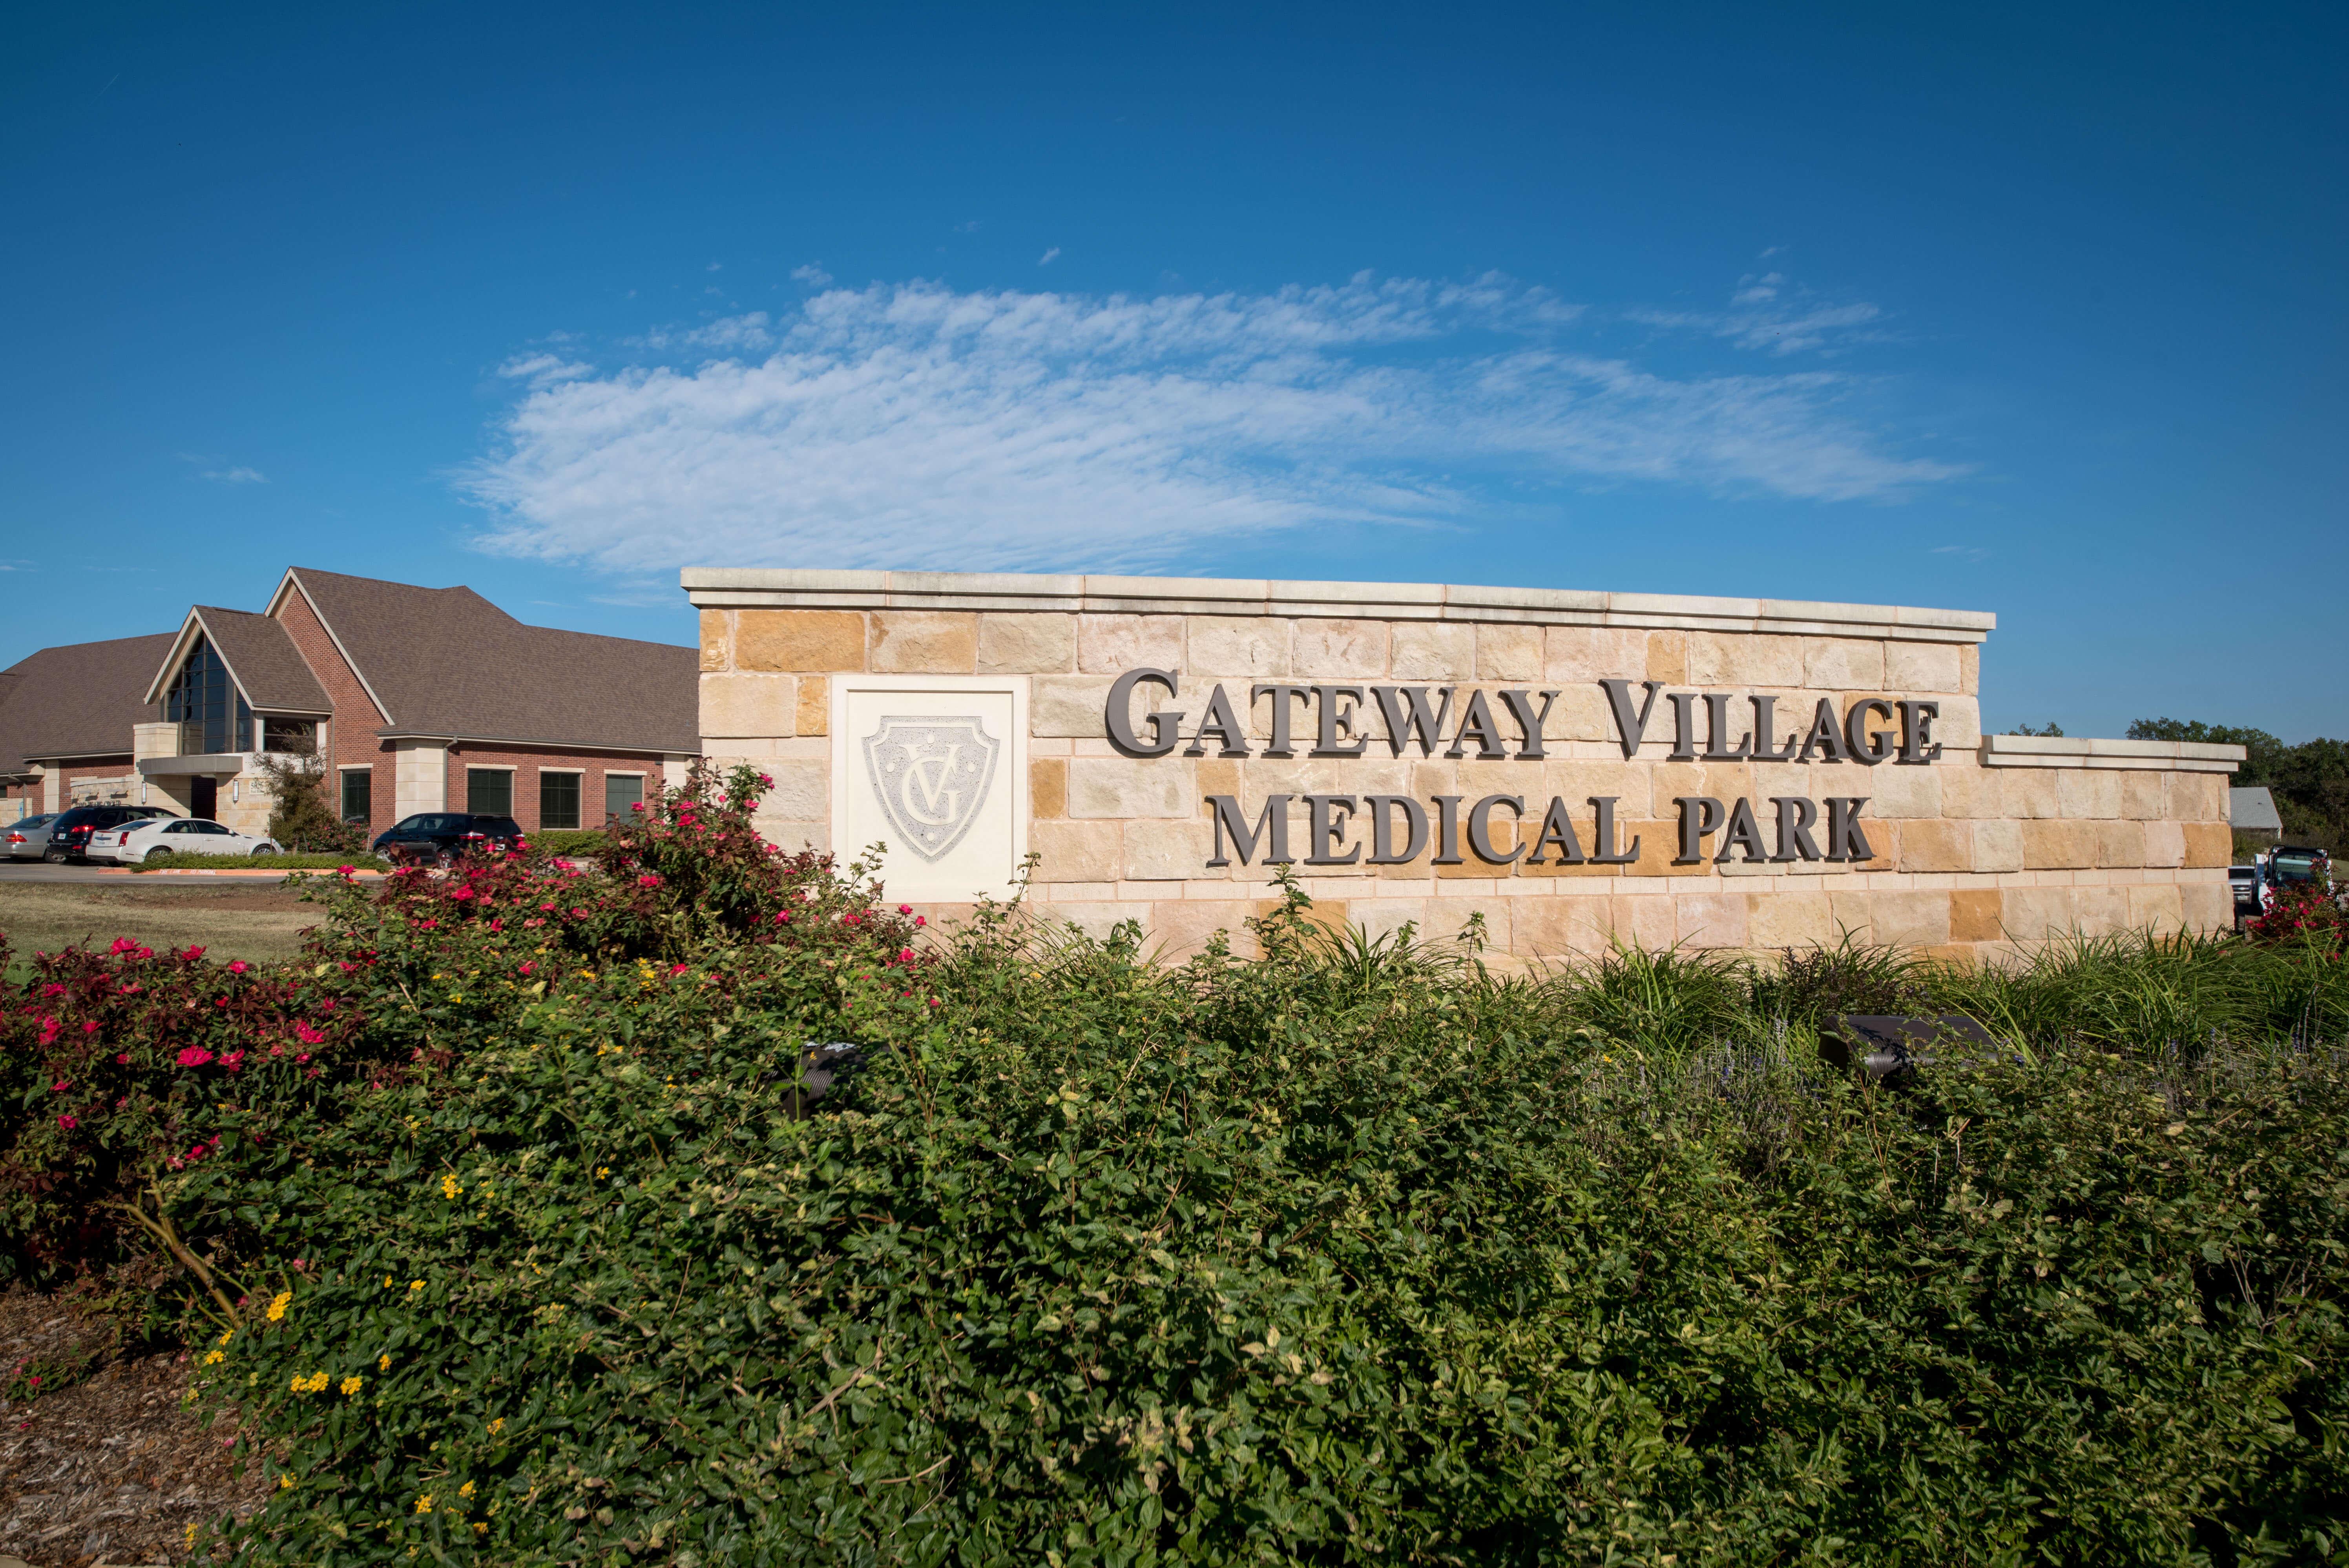 Gateway Village Medical Park